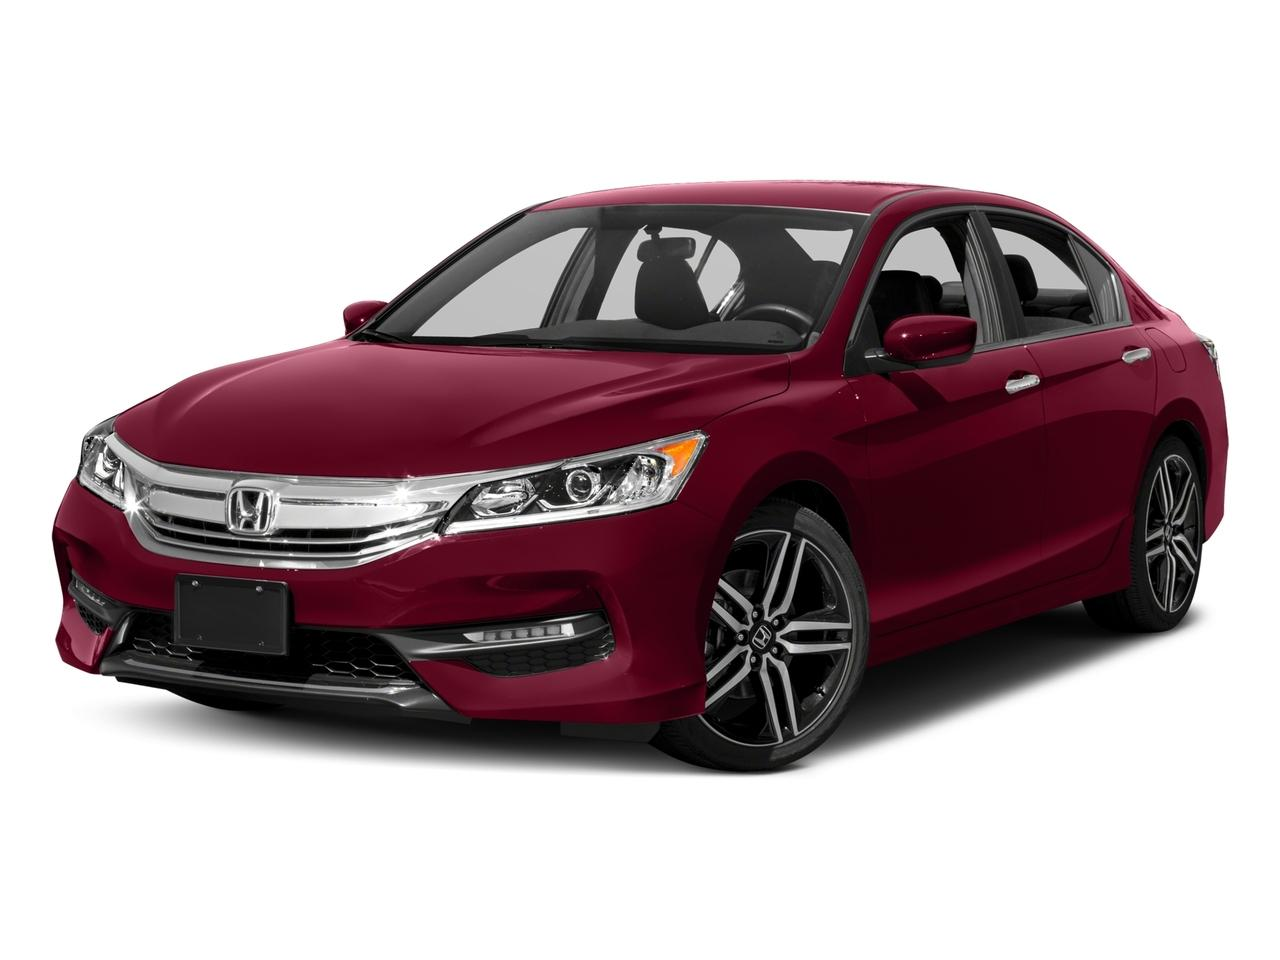 2017 Honda Accord Sedan Vehicle Photo in San Leandro, CA 94577